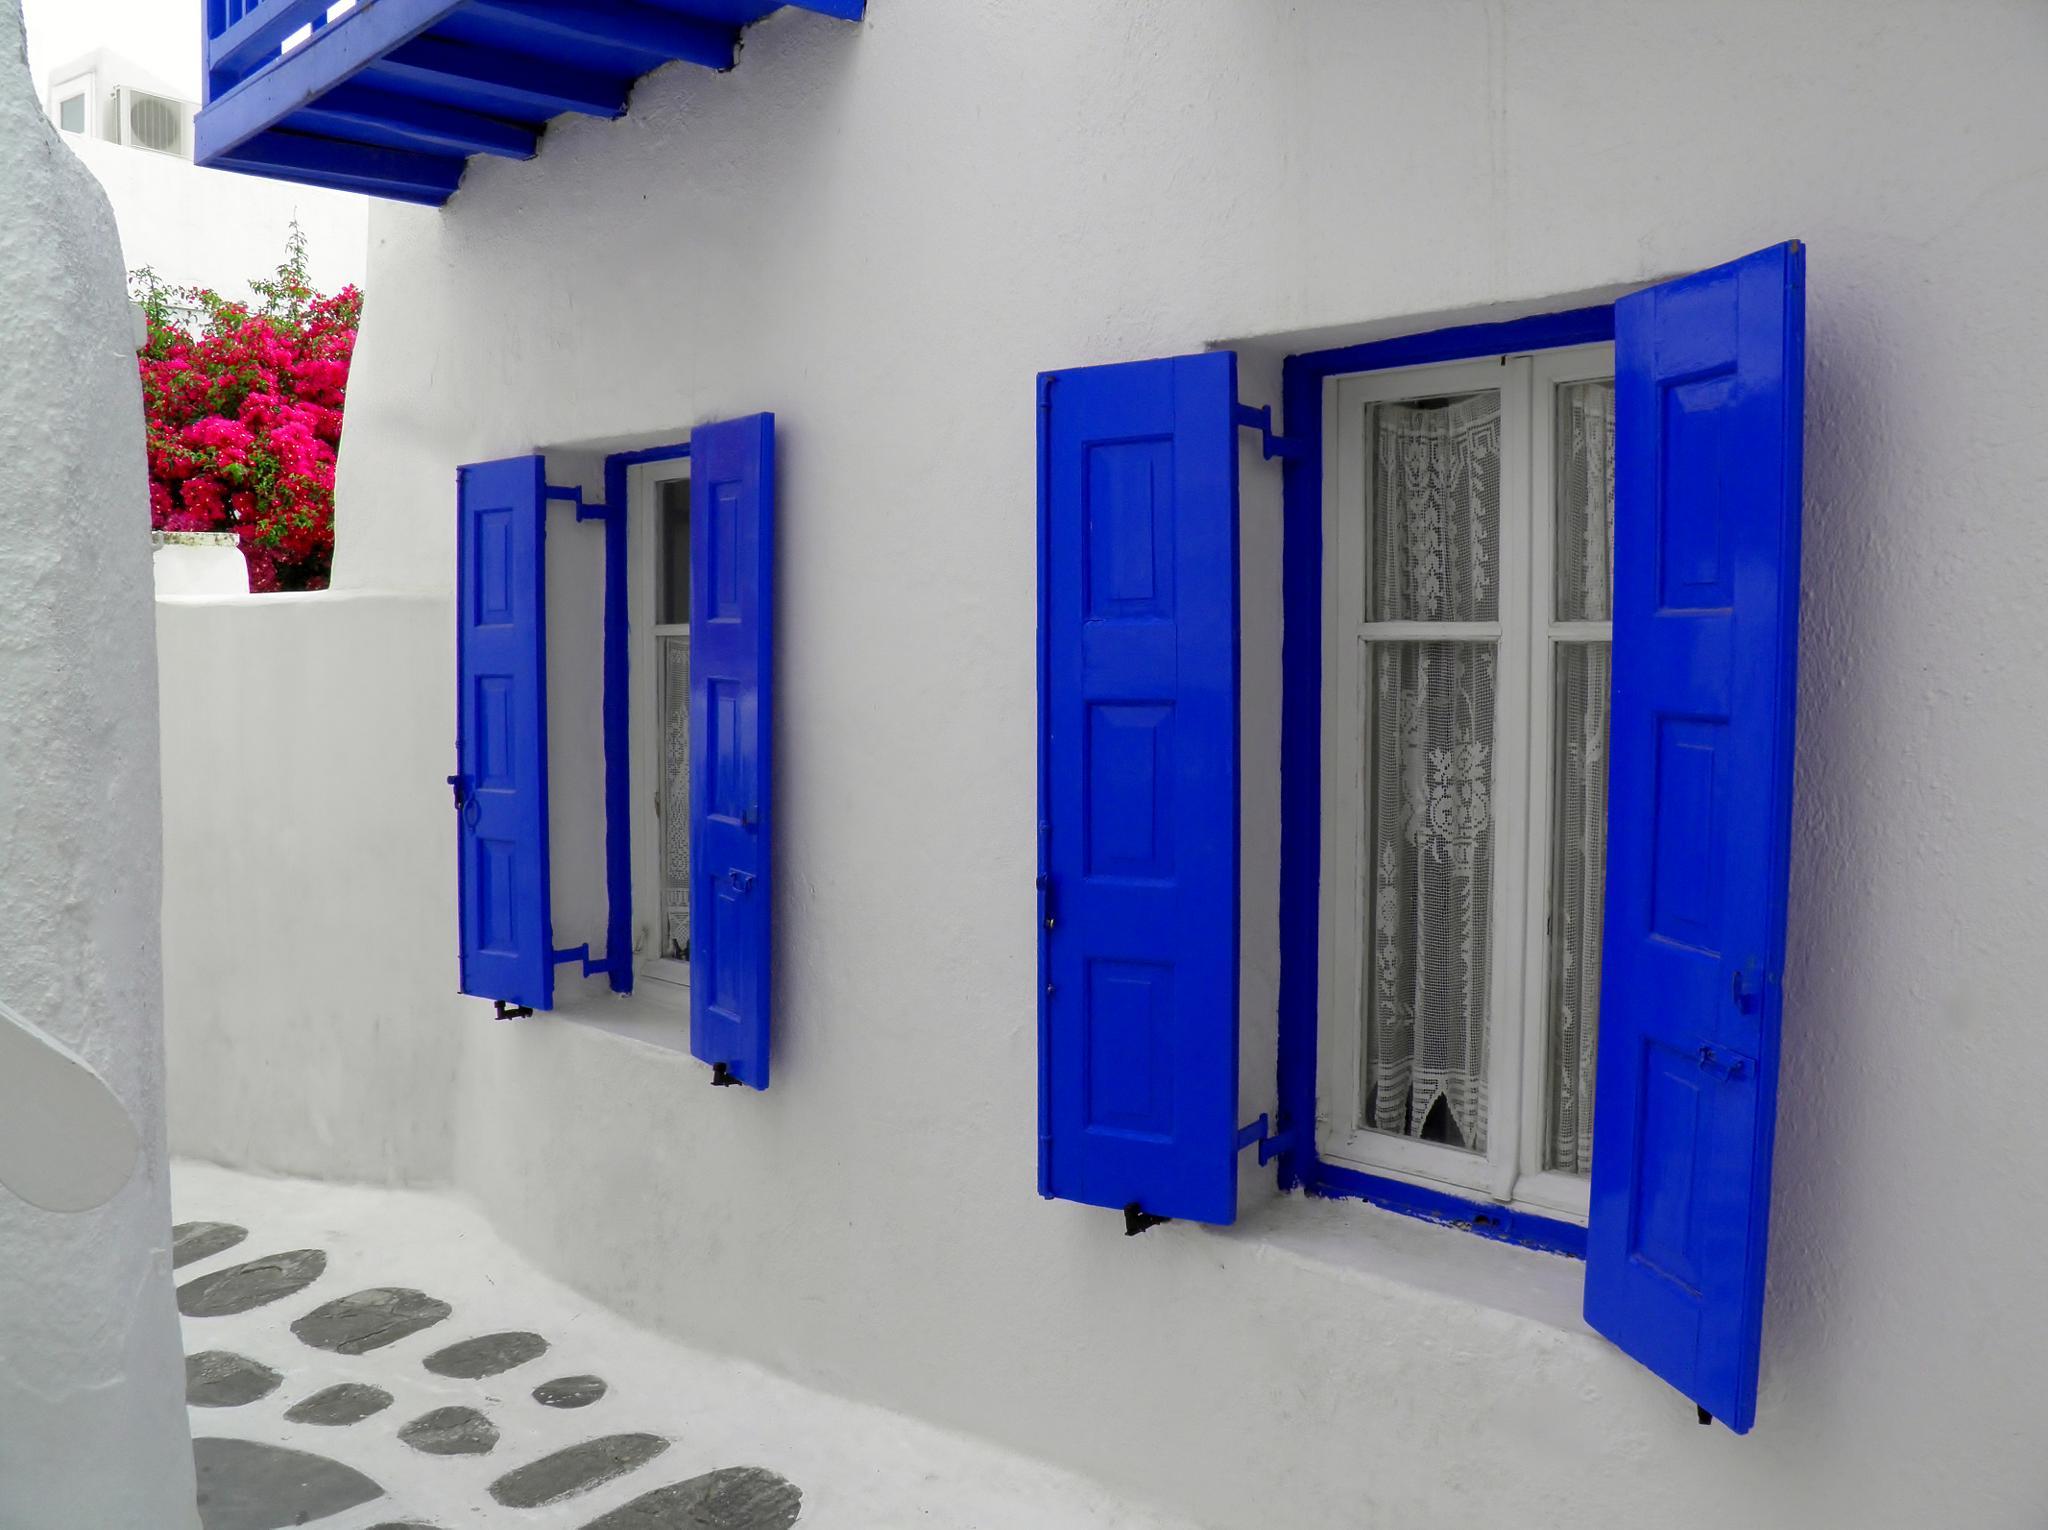 Santorini house  by Tamara M. Silvestre